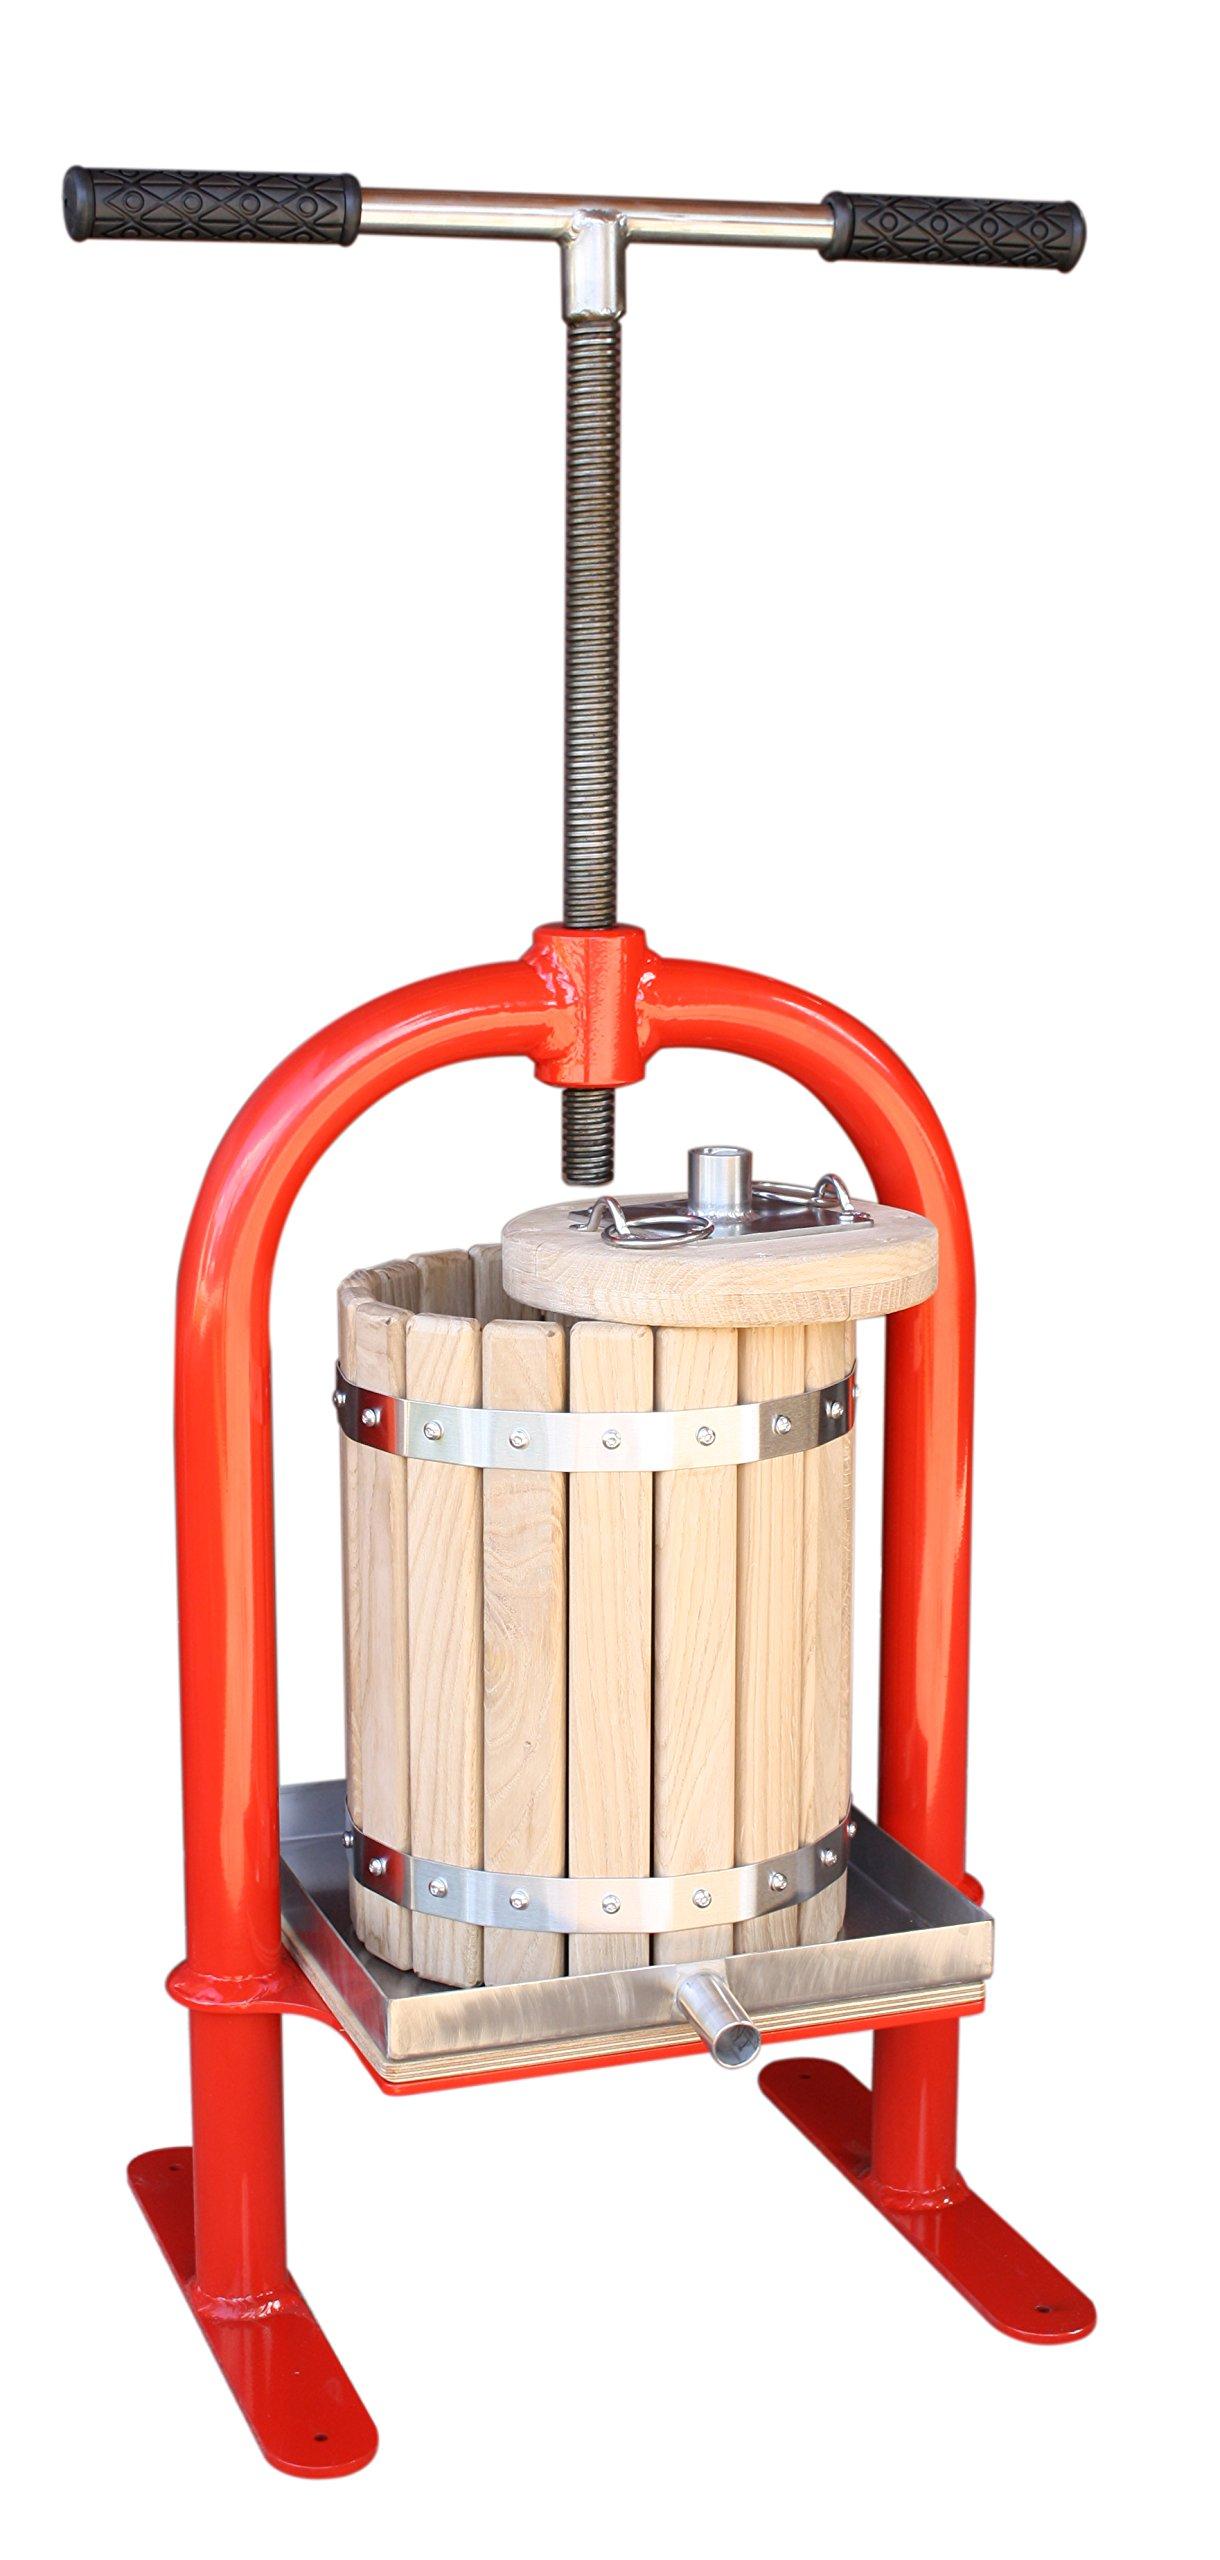 Screw press VP-10 - juicer for apples, grapes, berries, fruits, wine, cider